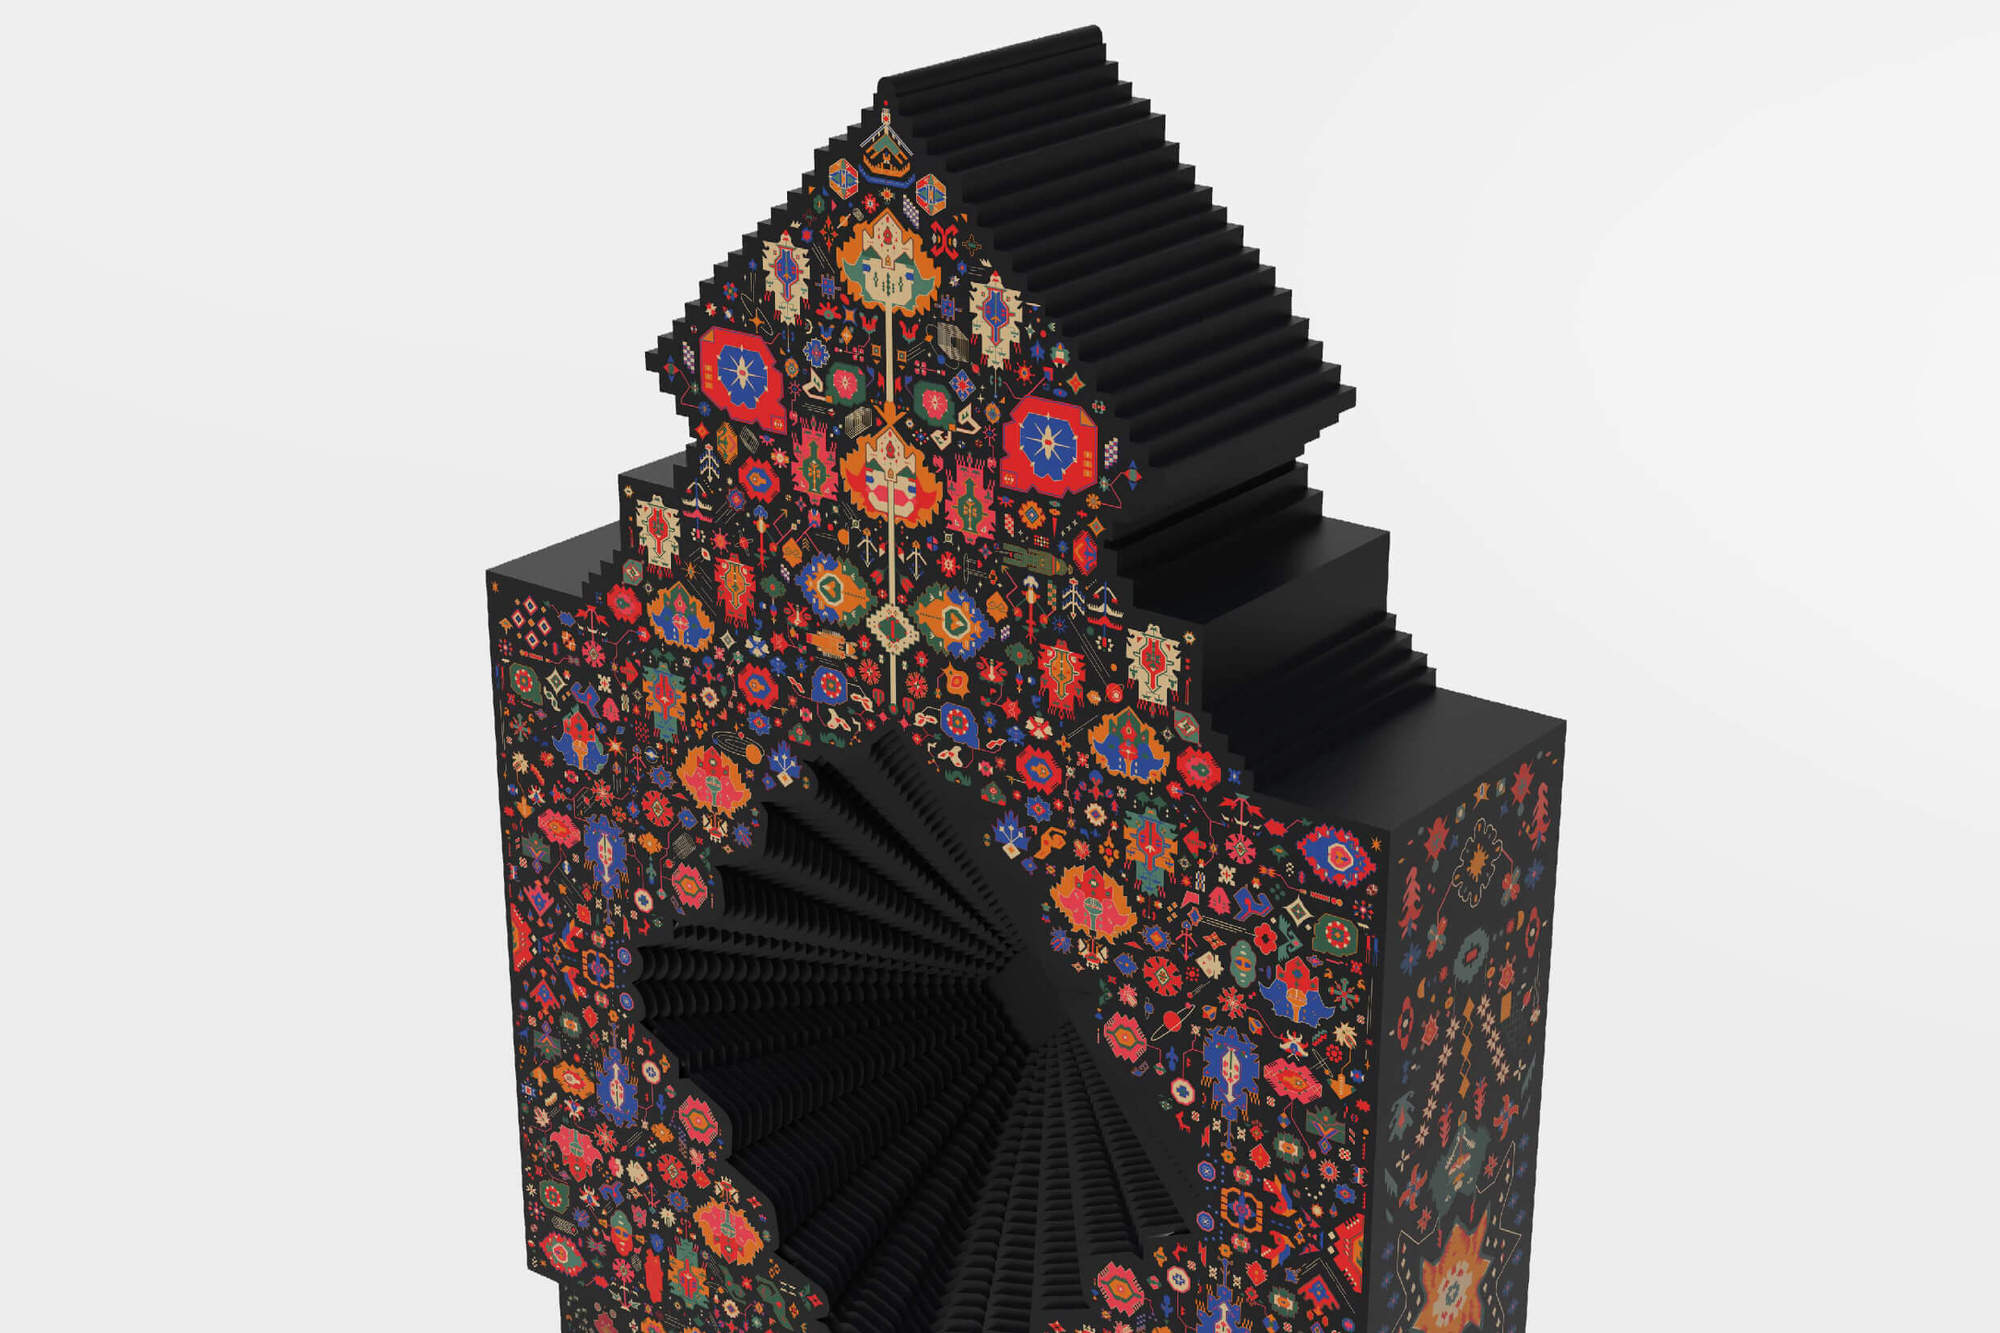 Design by Reborn's Persian Carpet Reincarnates as a 2-meter Magnetic Robot from Saigon.